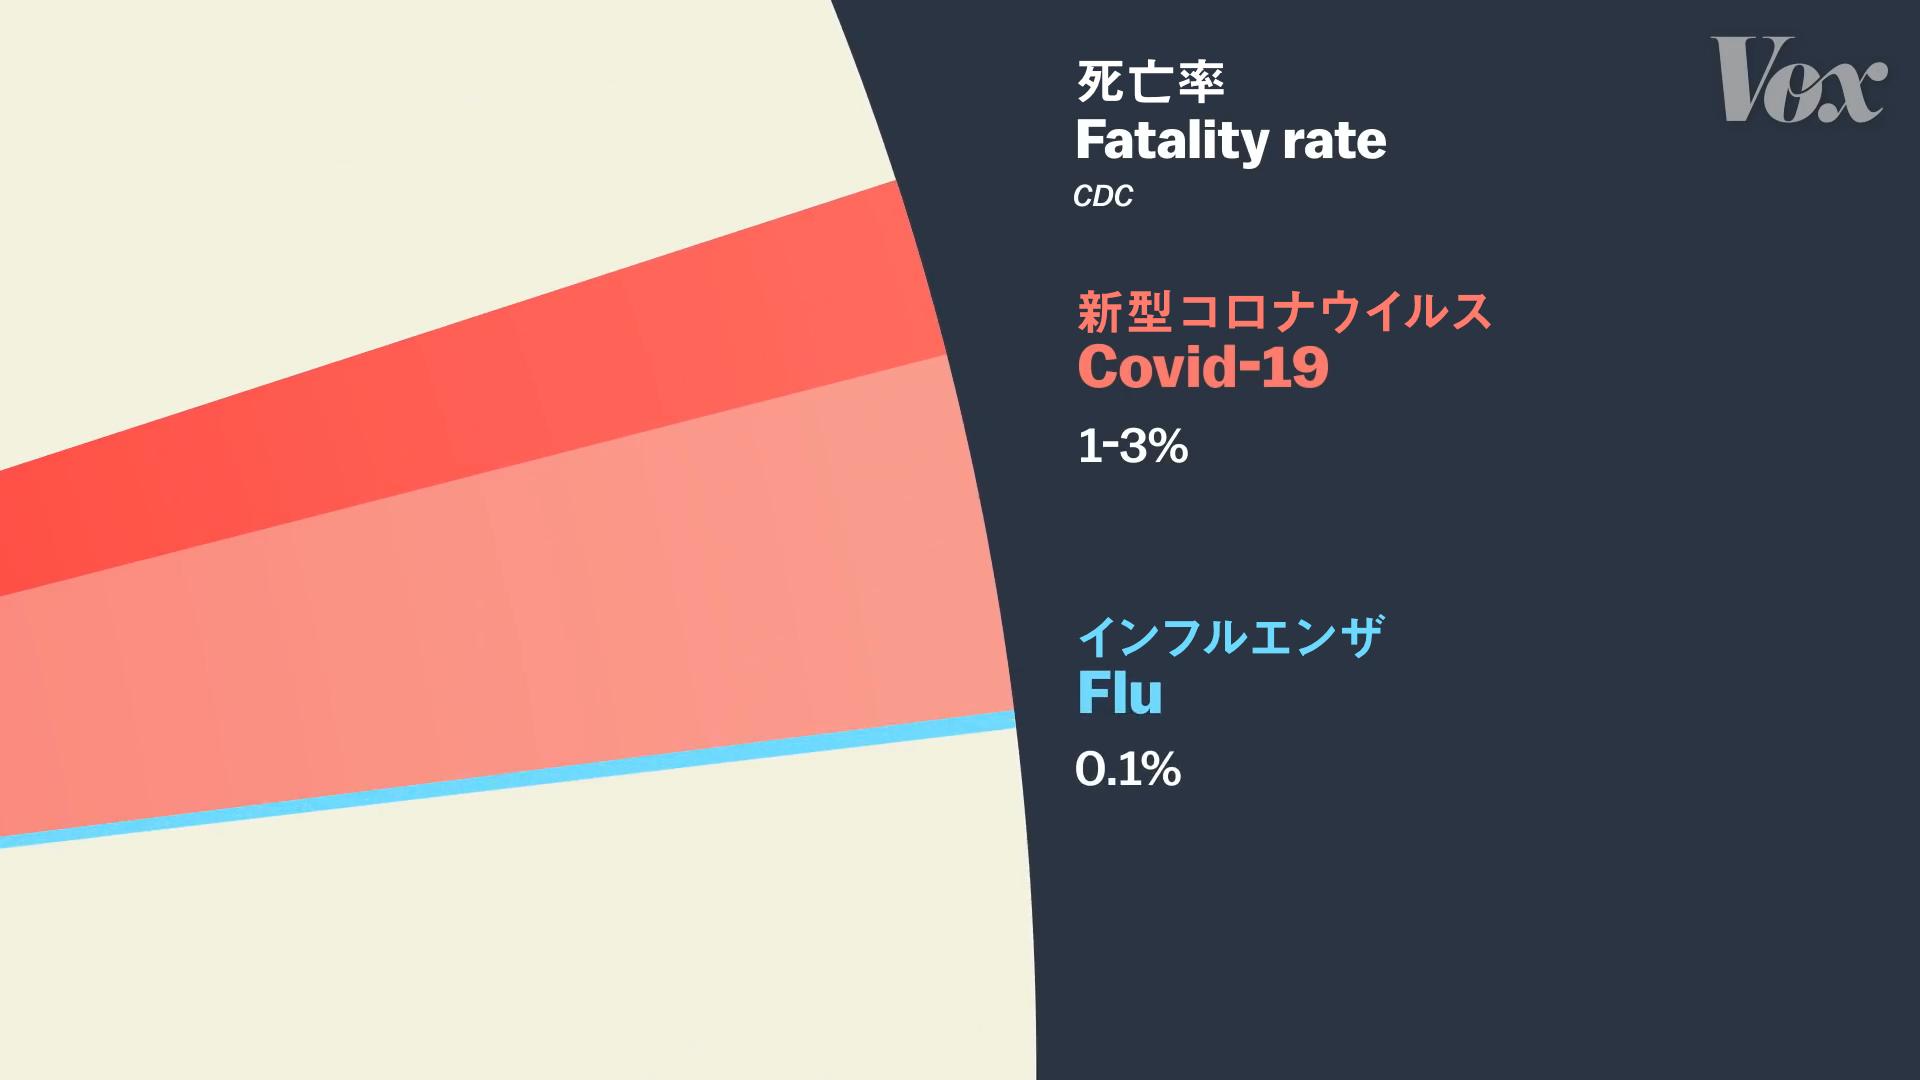 f:id:Imamura:20200408133429p:plain